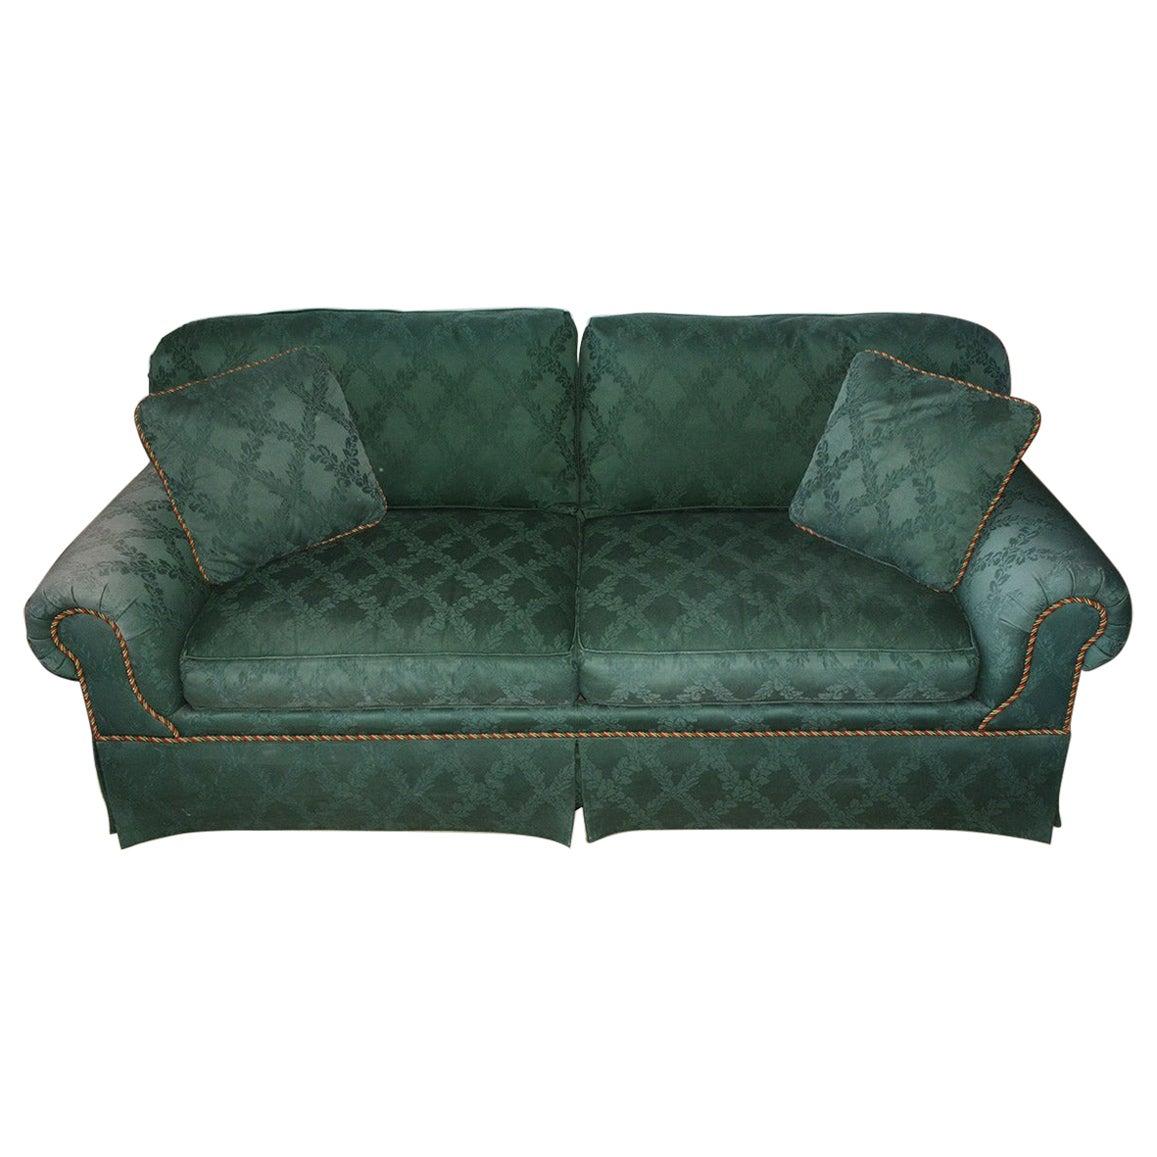 Custom English Style Rolled Arm Sofa